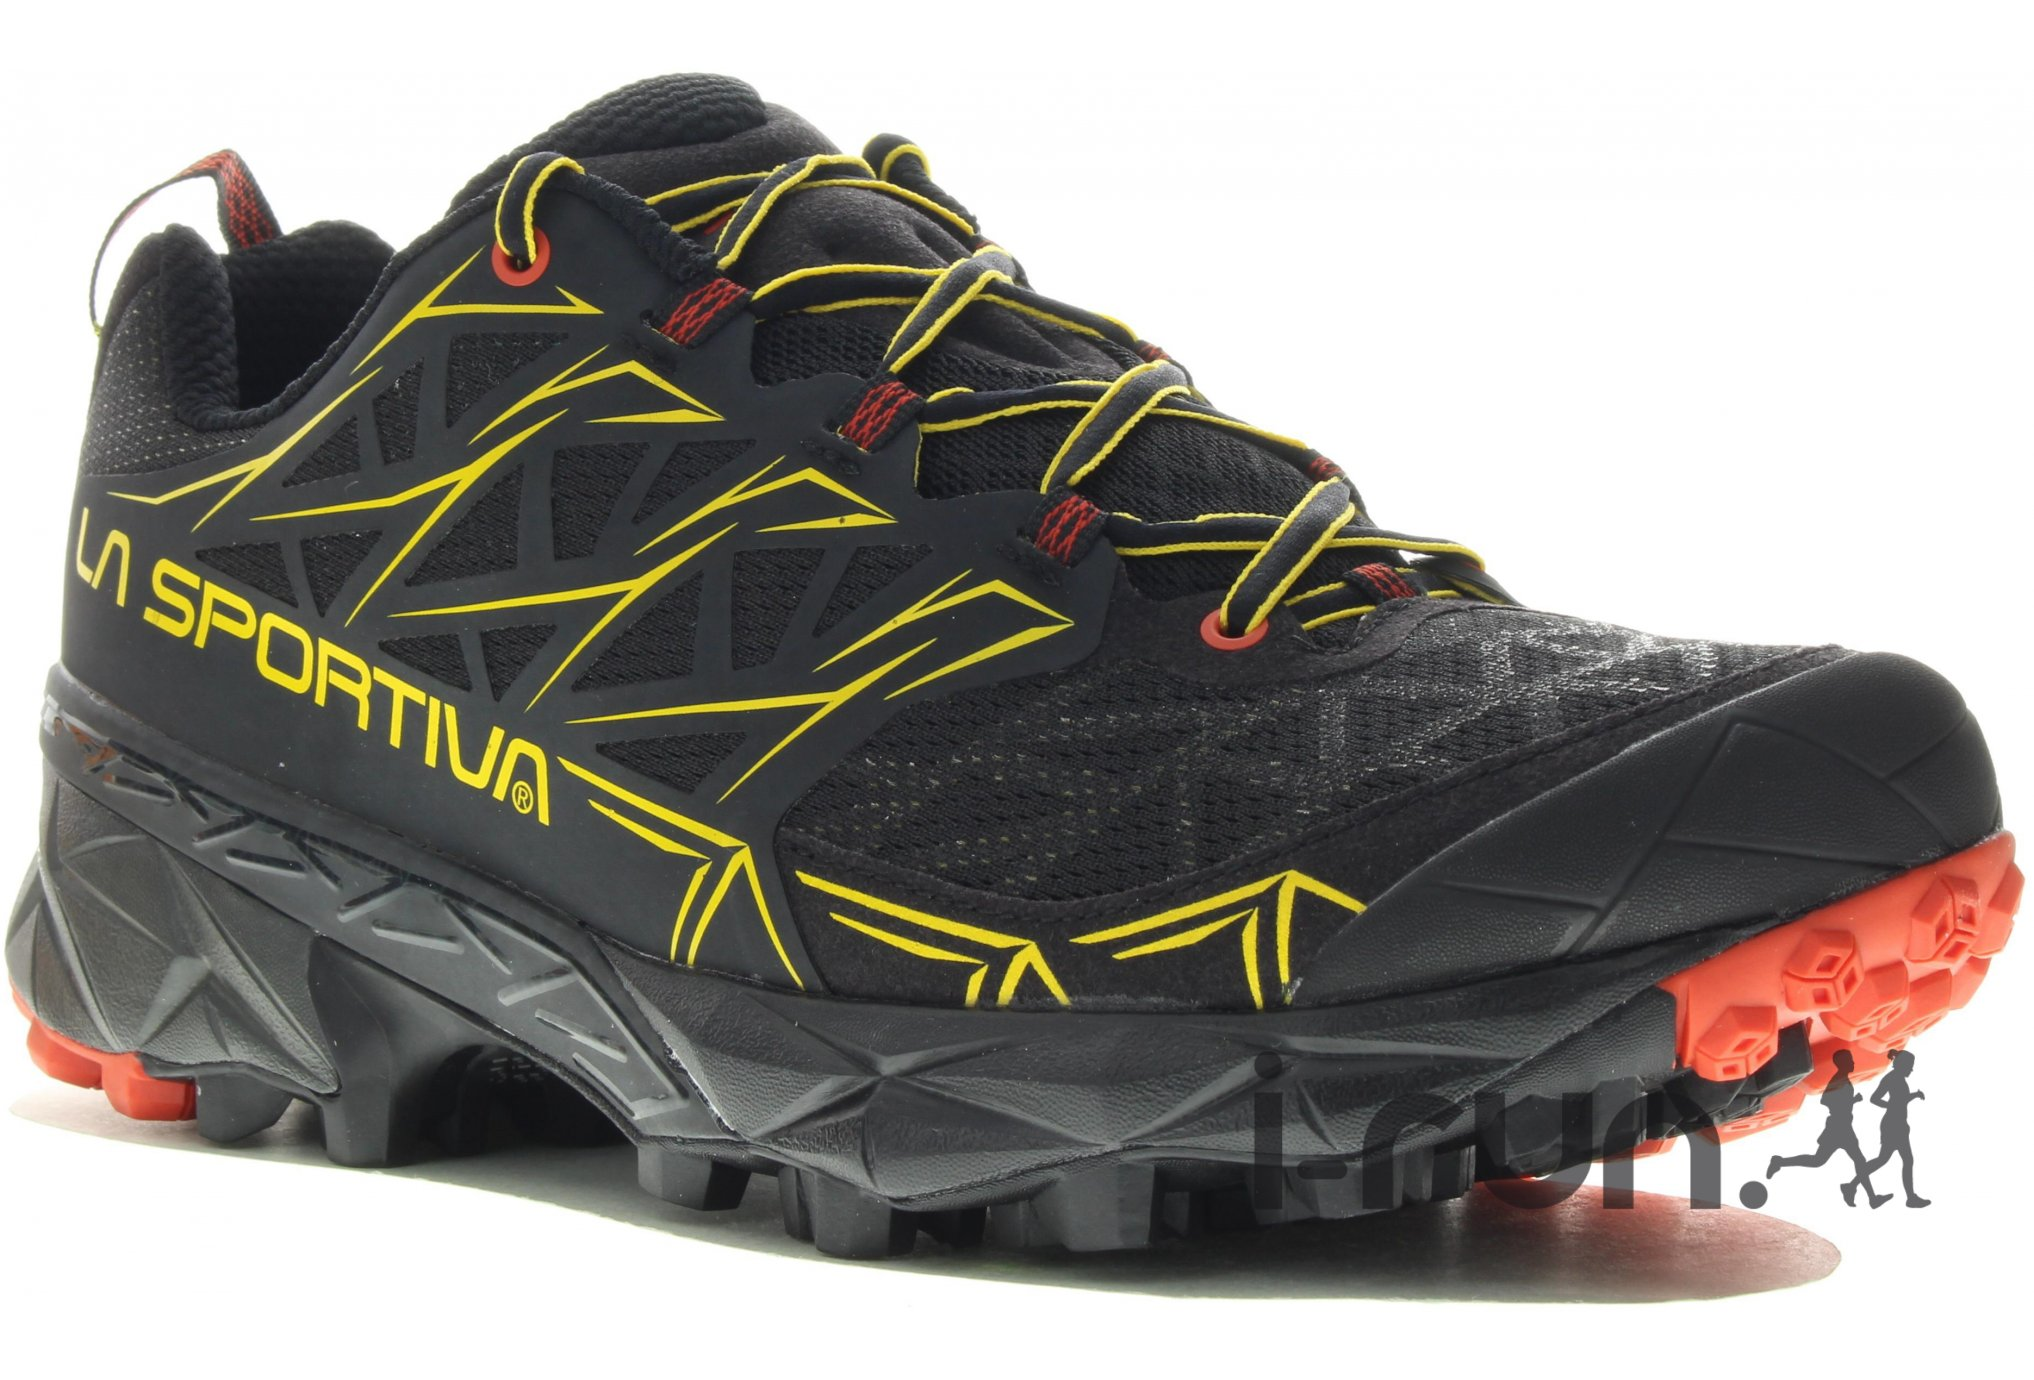 La Sportiva Akyra Chaussures homme